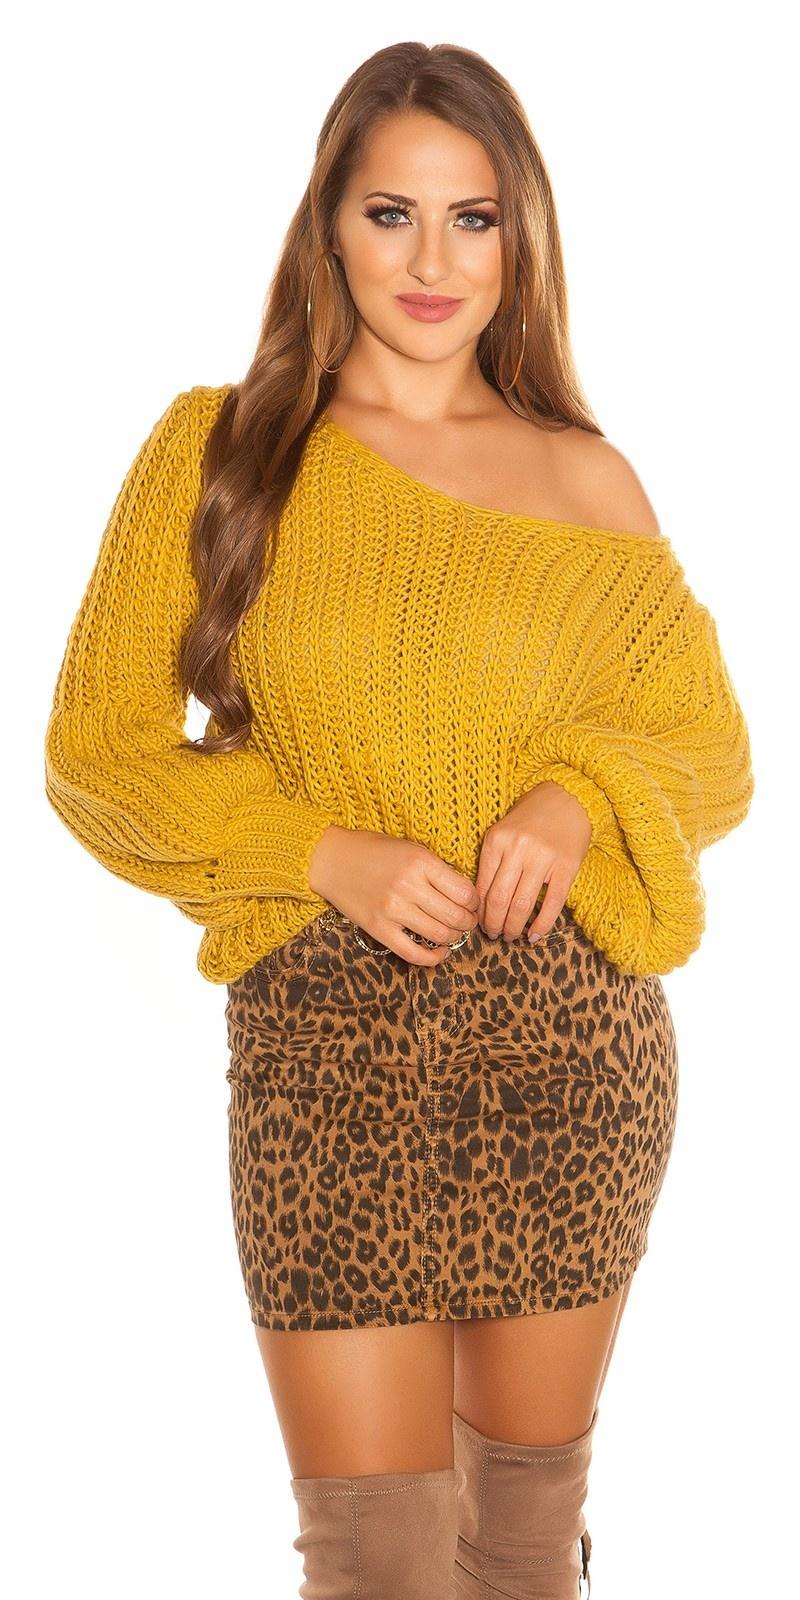 Sexy oversized grof gebreide sweater-trui mosterdgeel